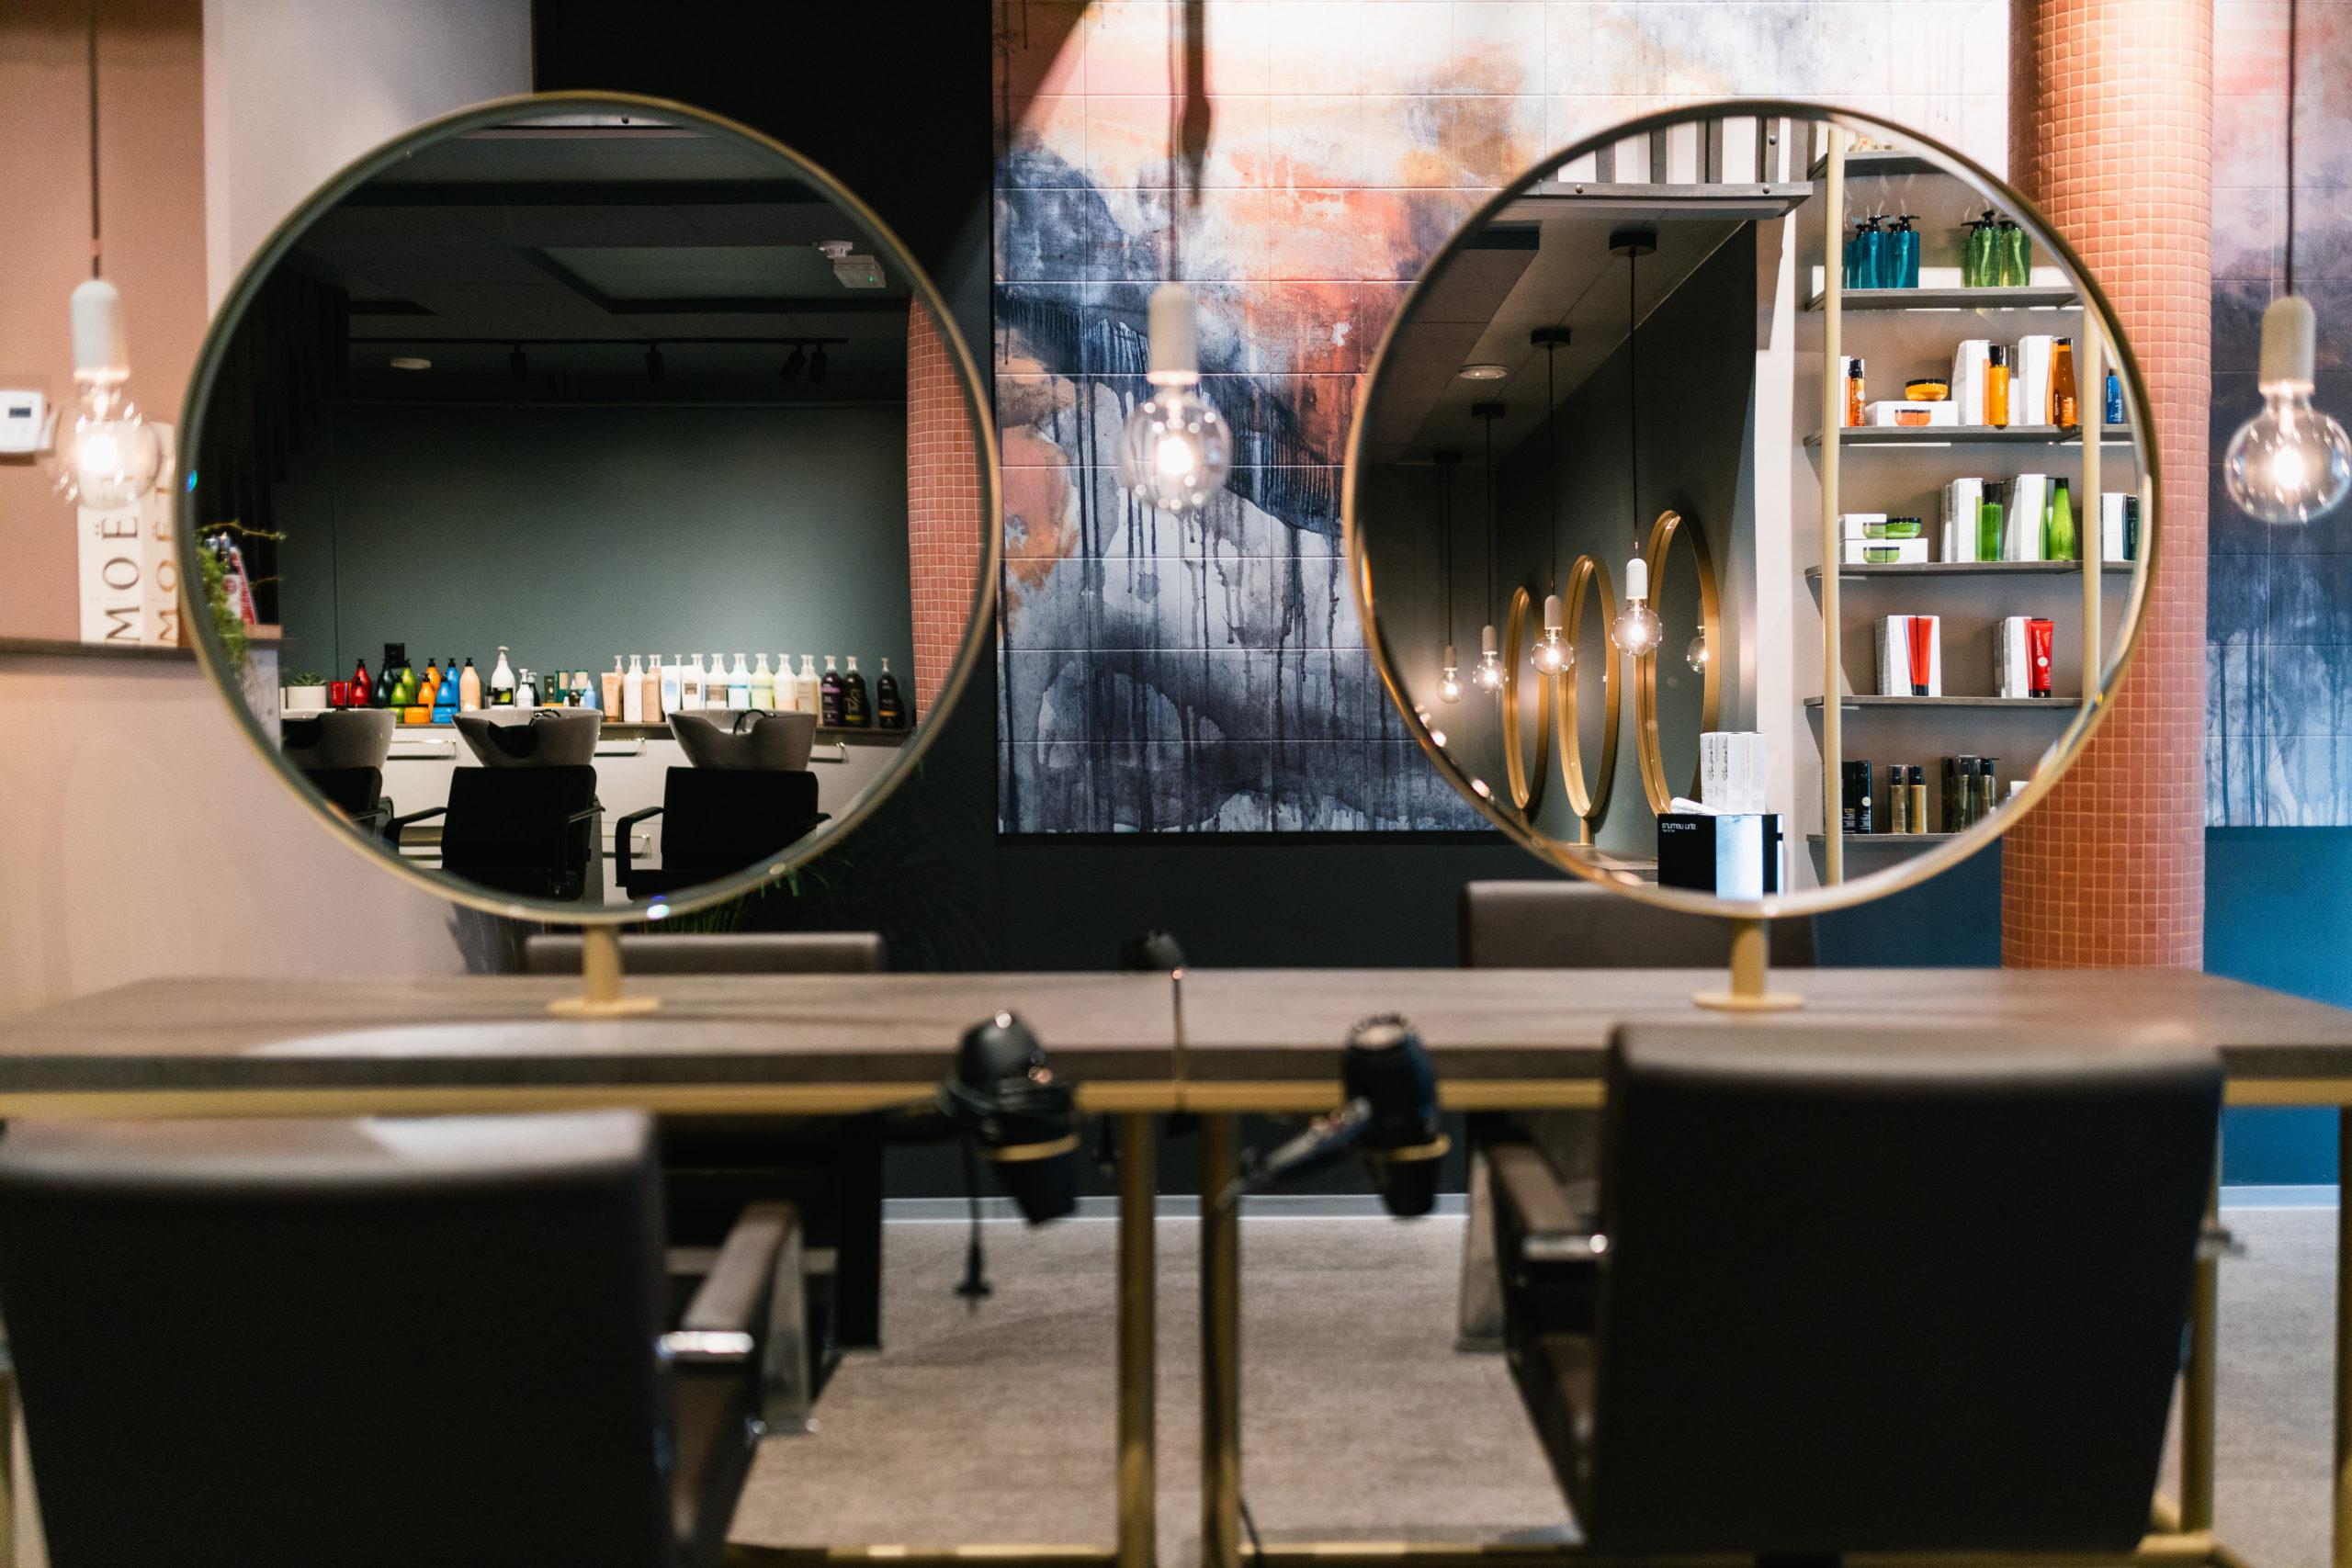 Olimb & Co Munch brygge - vår frisørsalong i Barcode